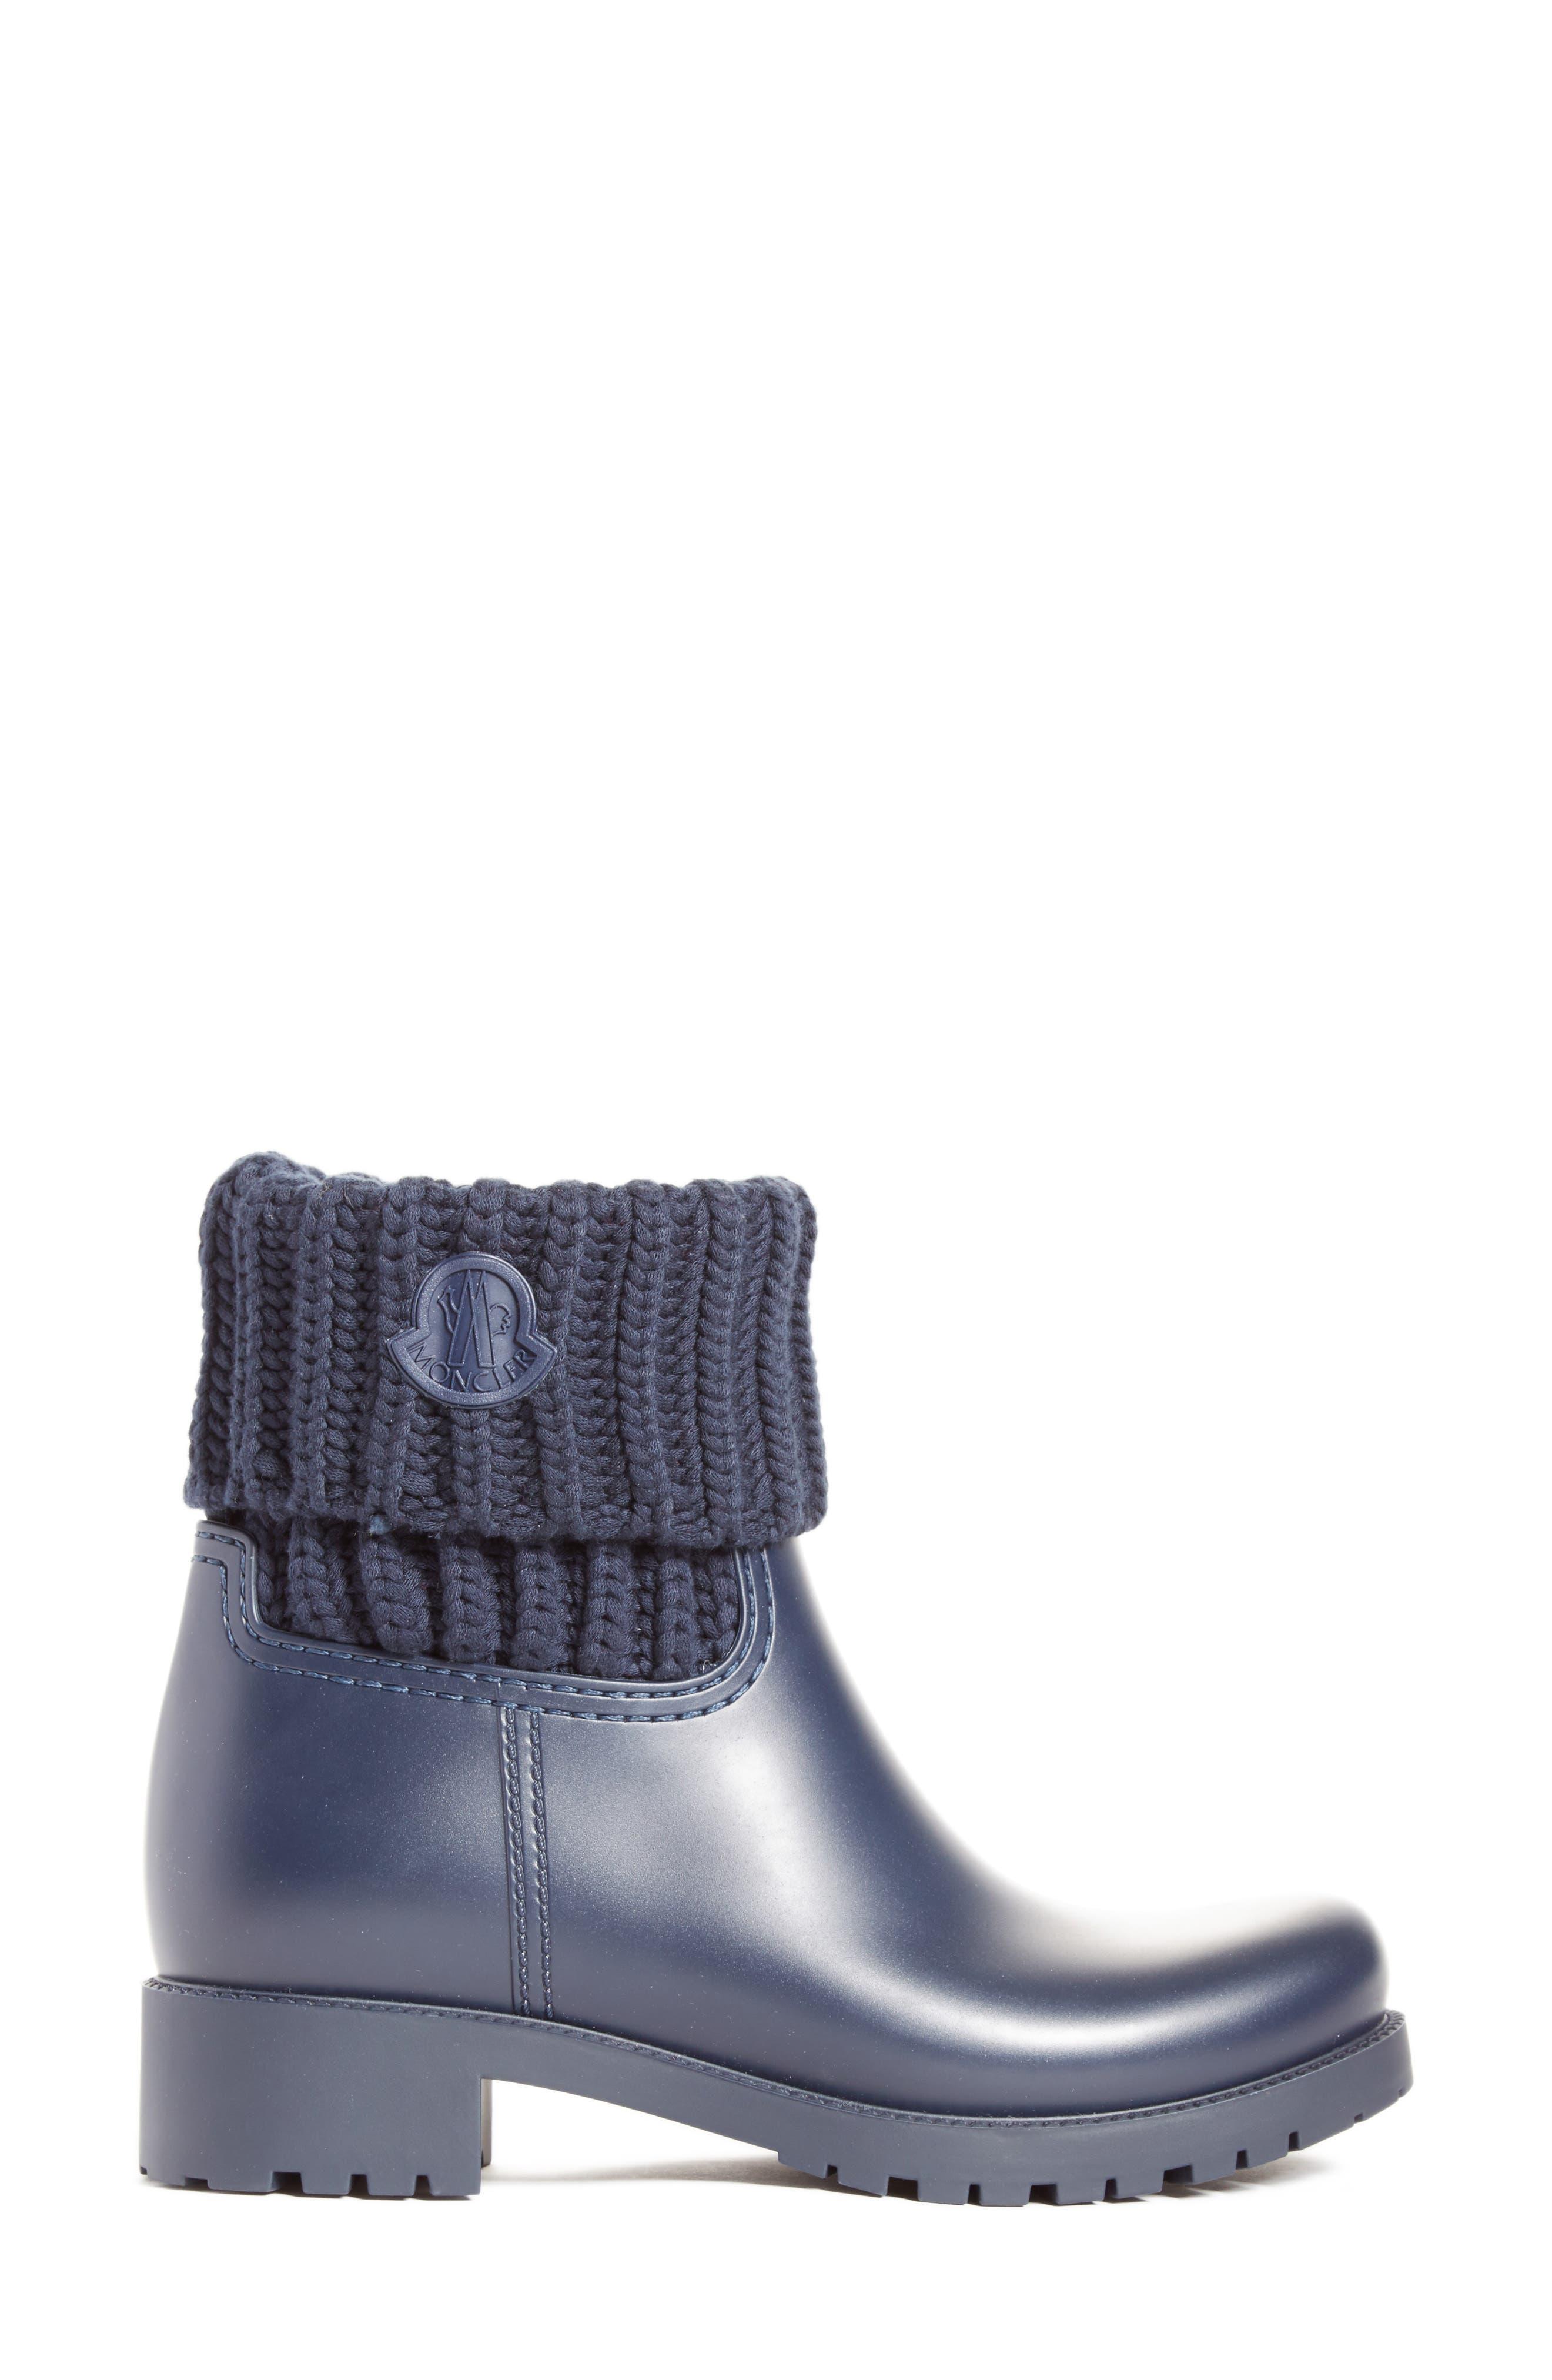 Alternate Image 3  - Moncler 'Ginette' Knit Cuff Leather Rain Boot (Women)